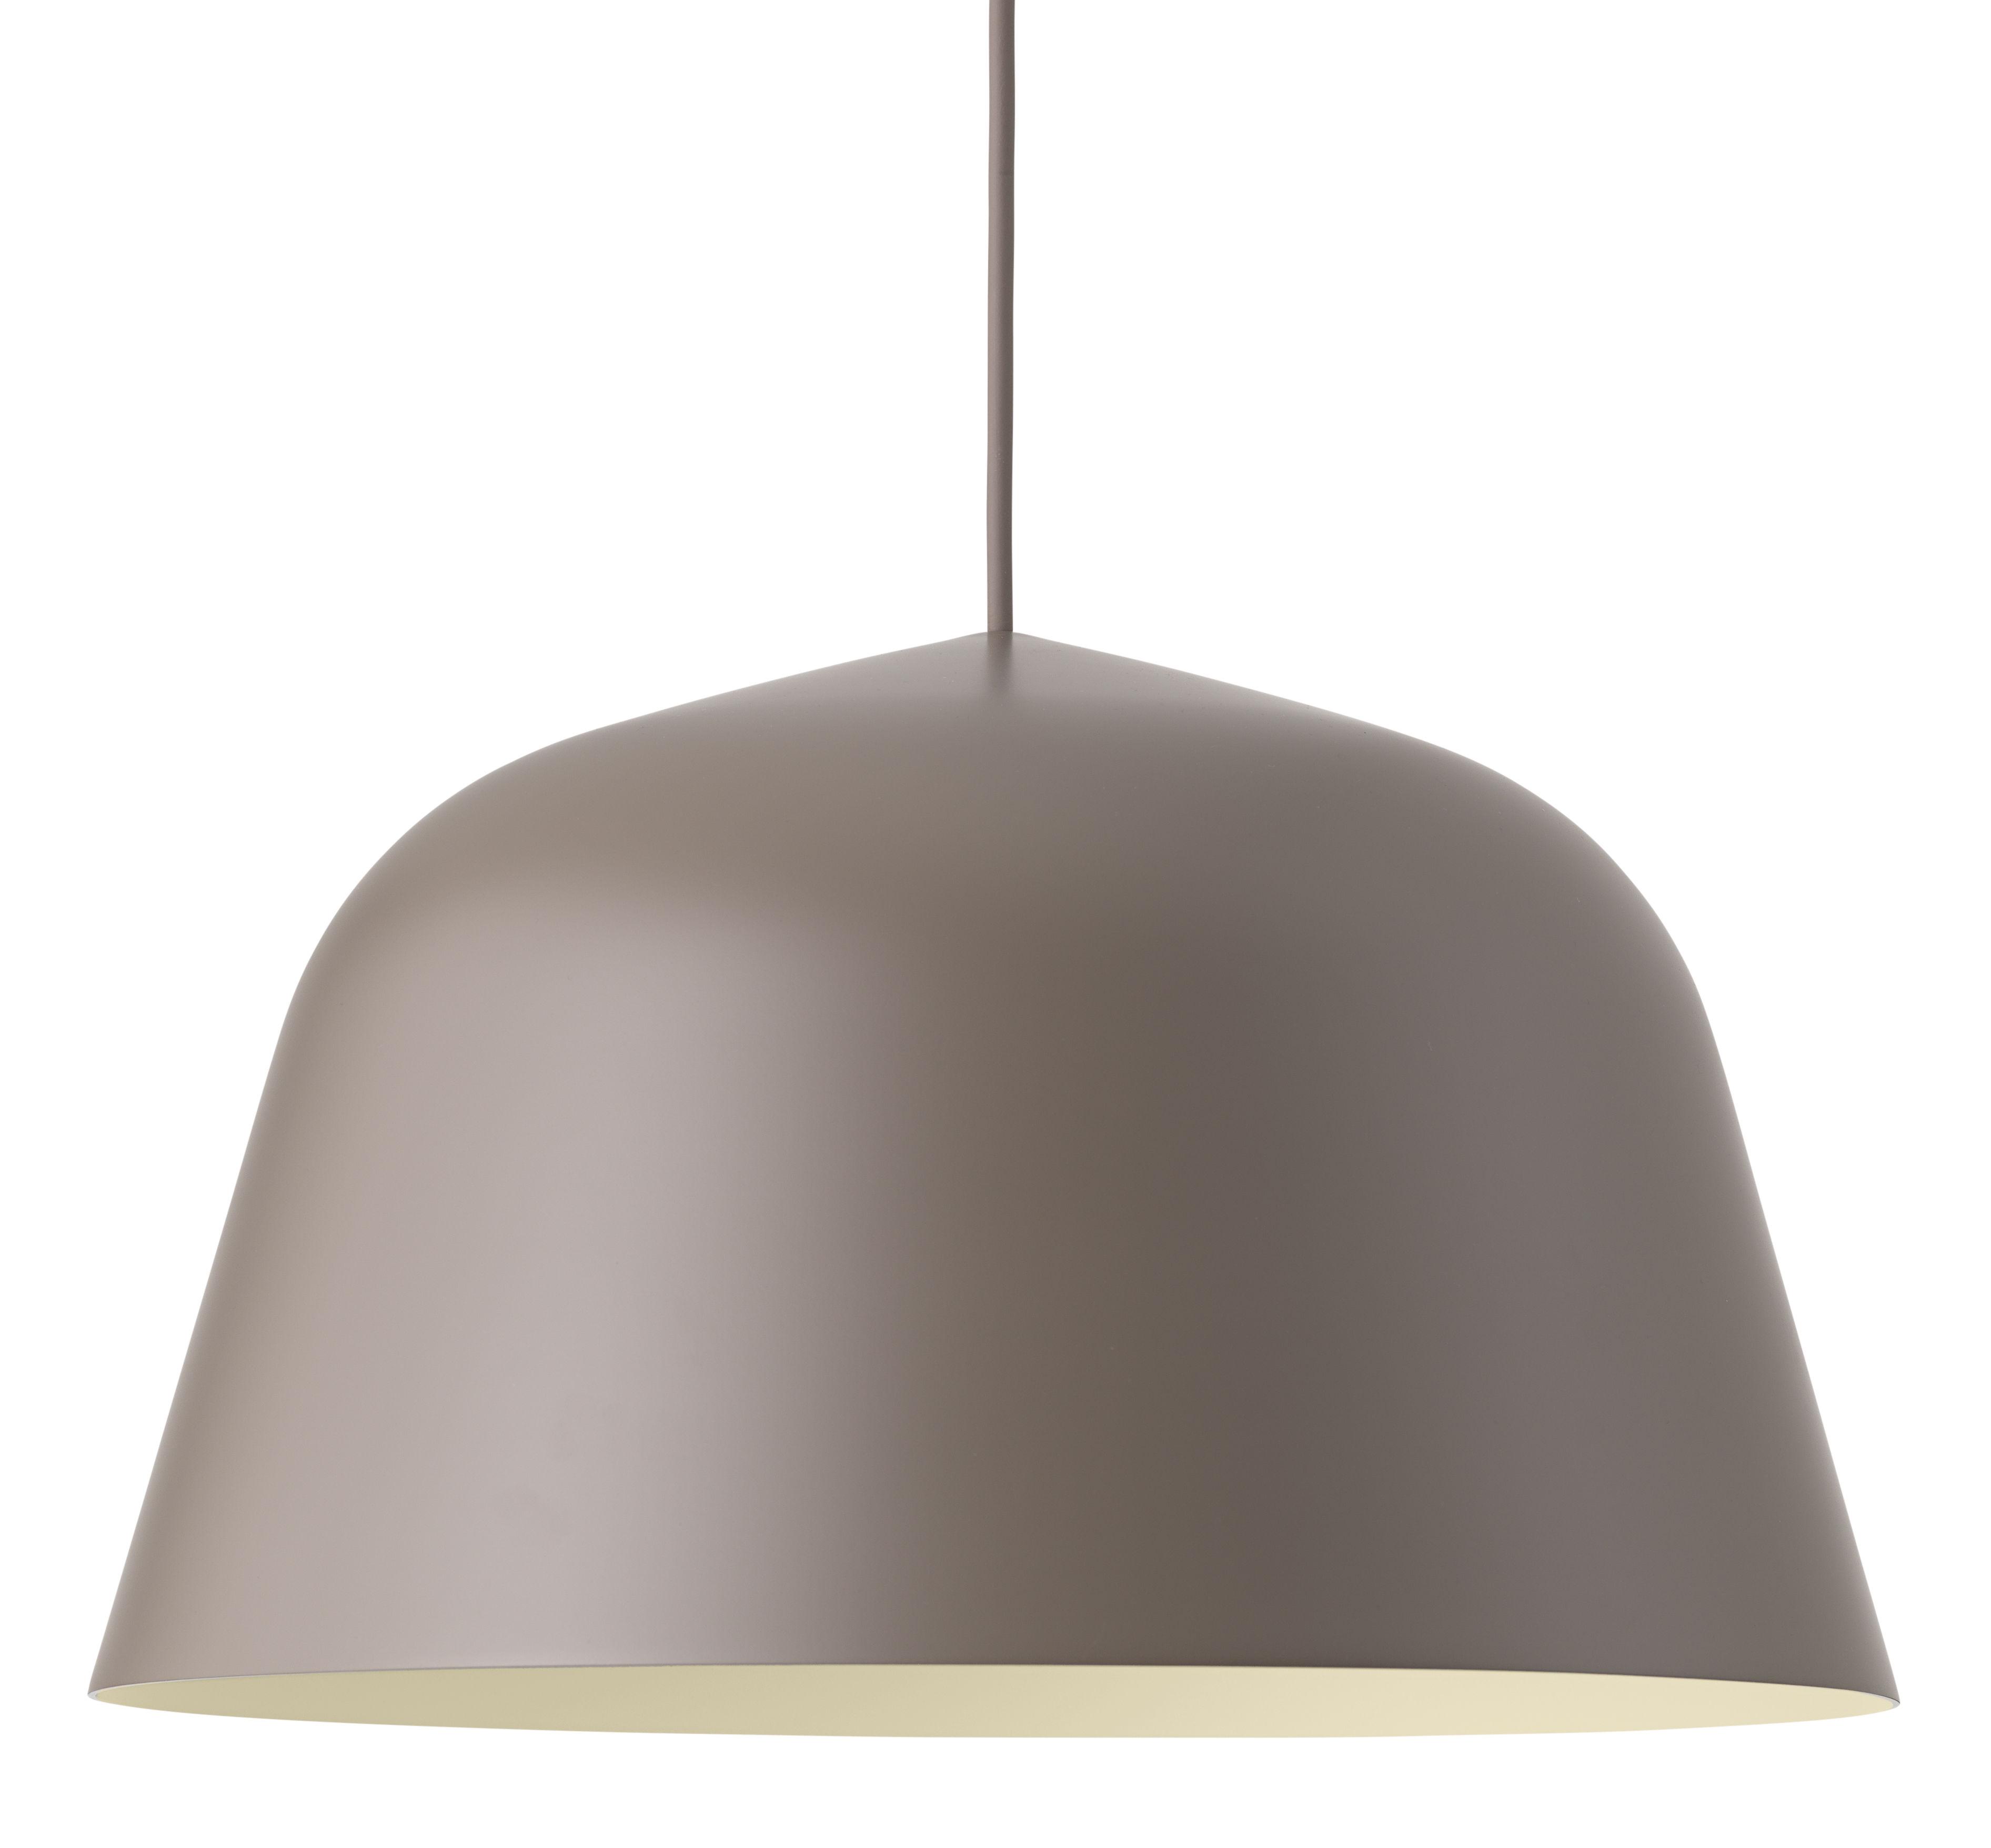 Lighting - Pendant Lighting - Ambit Pendant - / Ø 40 cm by Muuto - Taupe - Aluminium